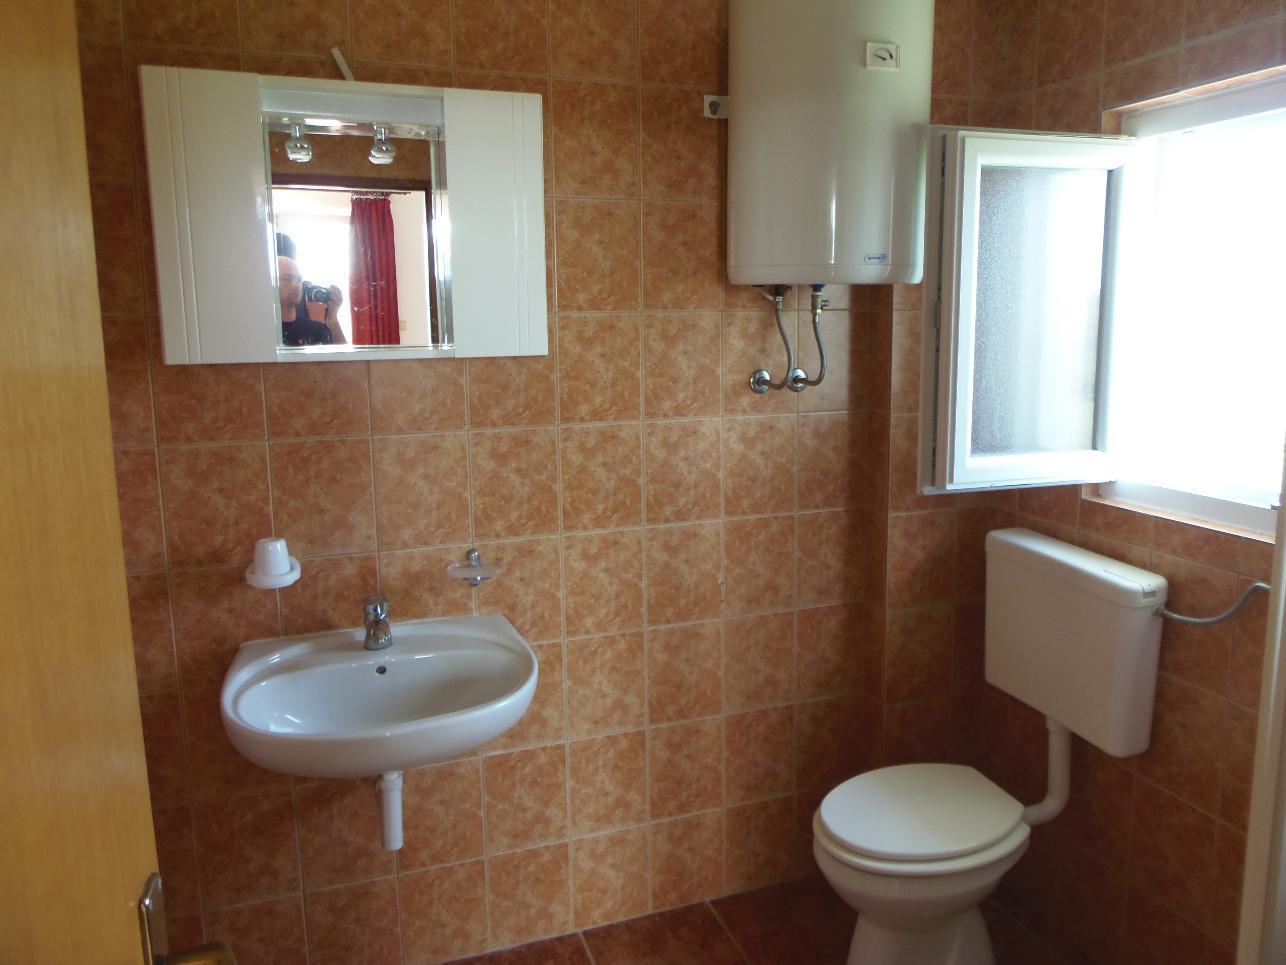 2235 - Povljana - Appartementen Kroatië - A2 veliki (2+2): badkamer met toilet